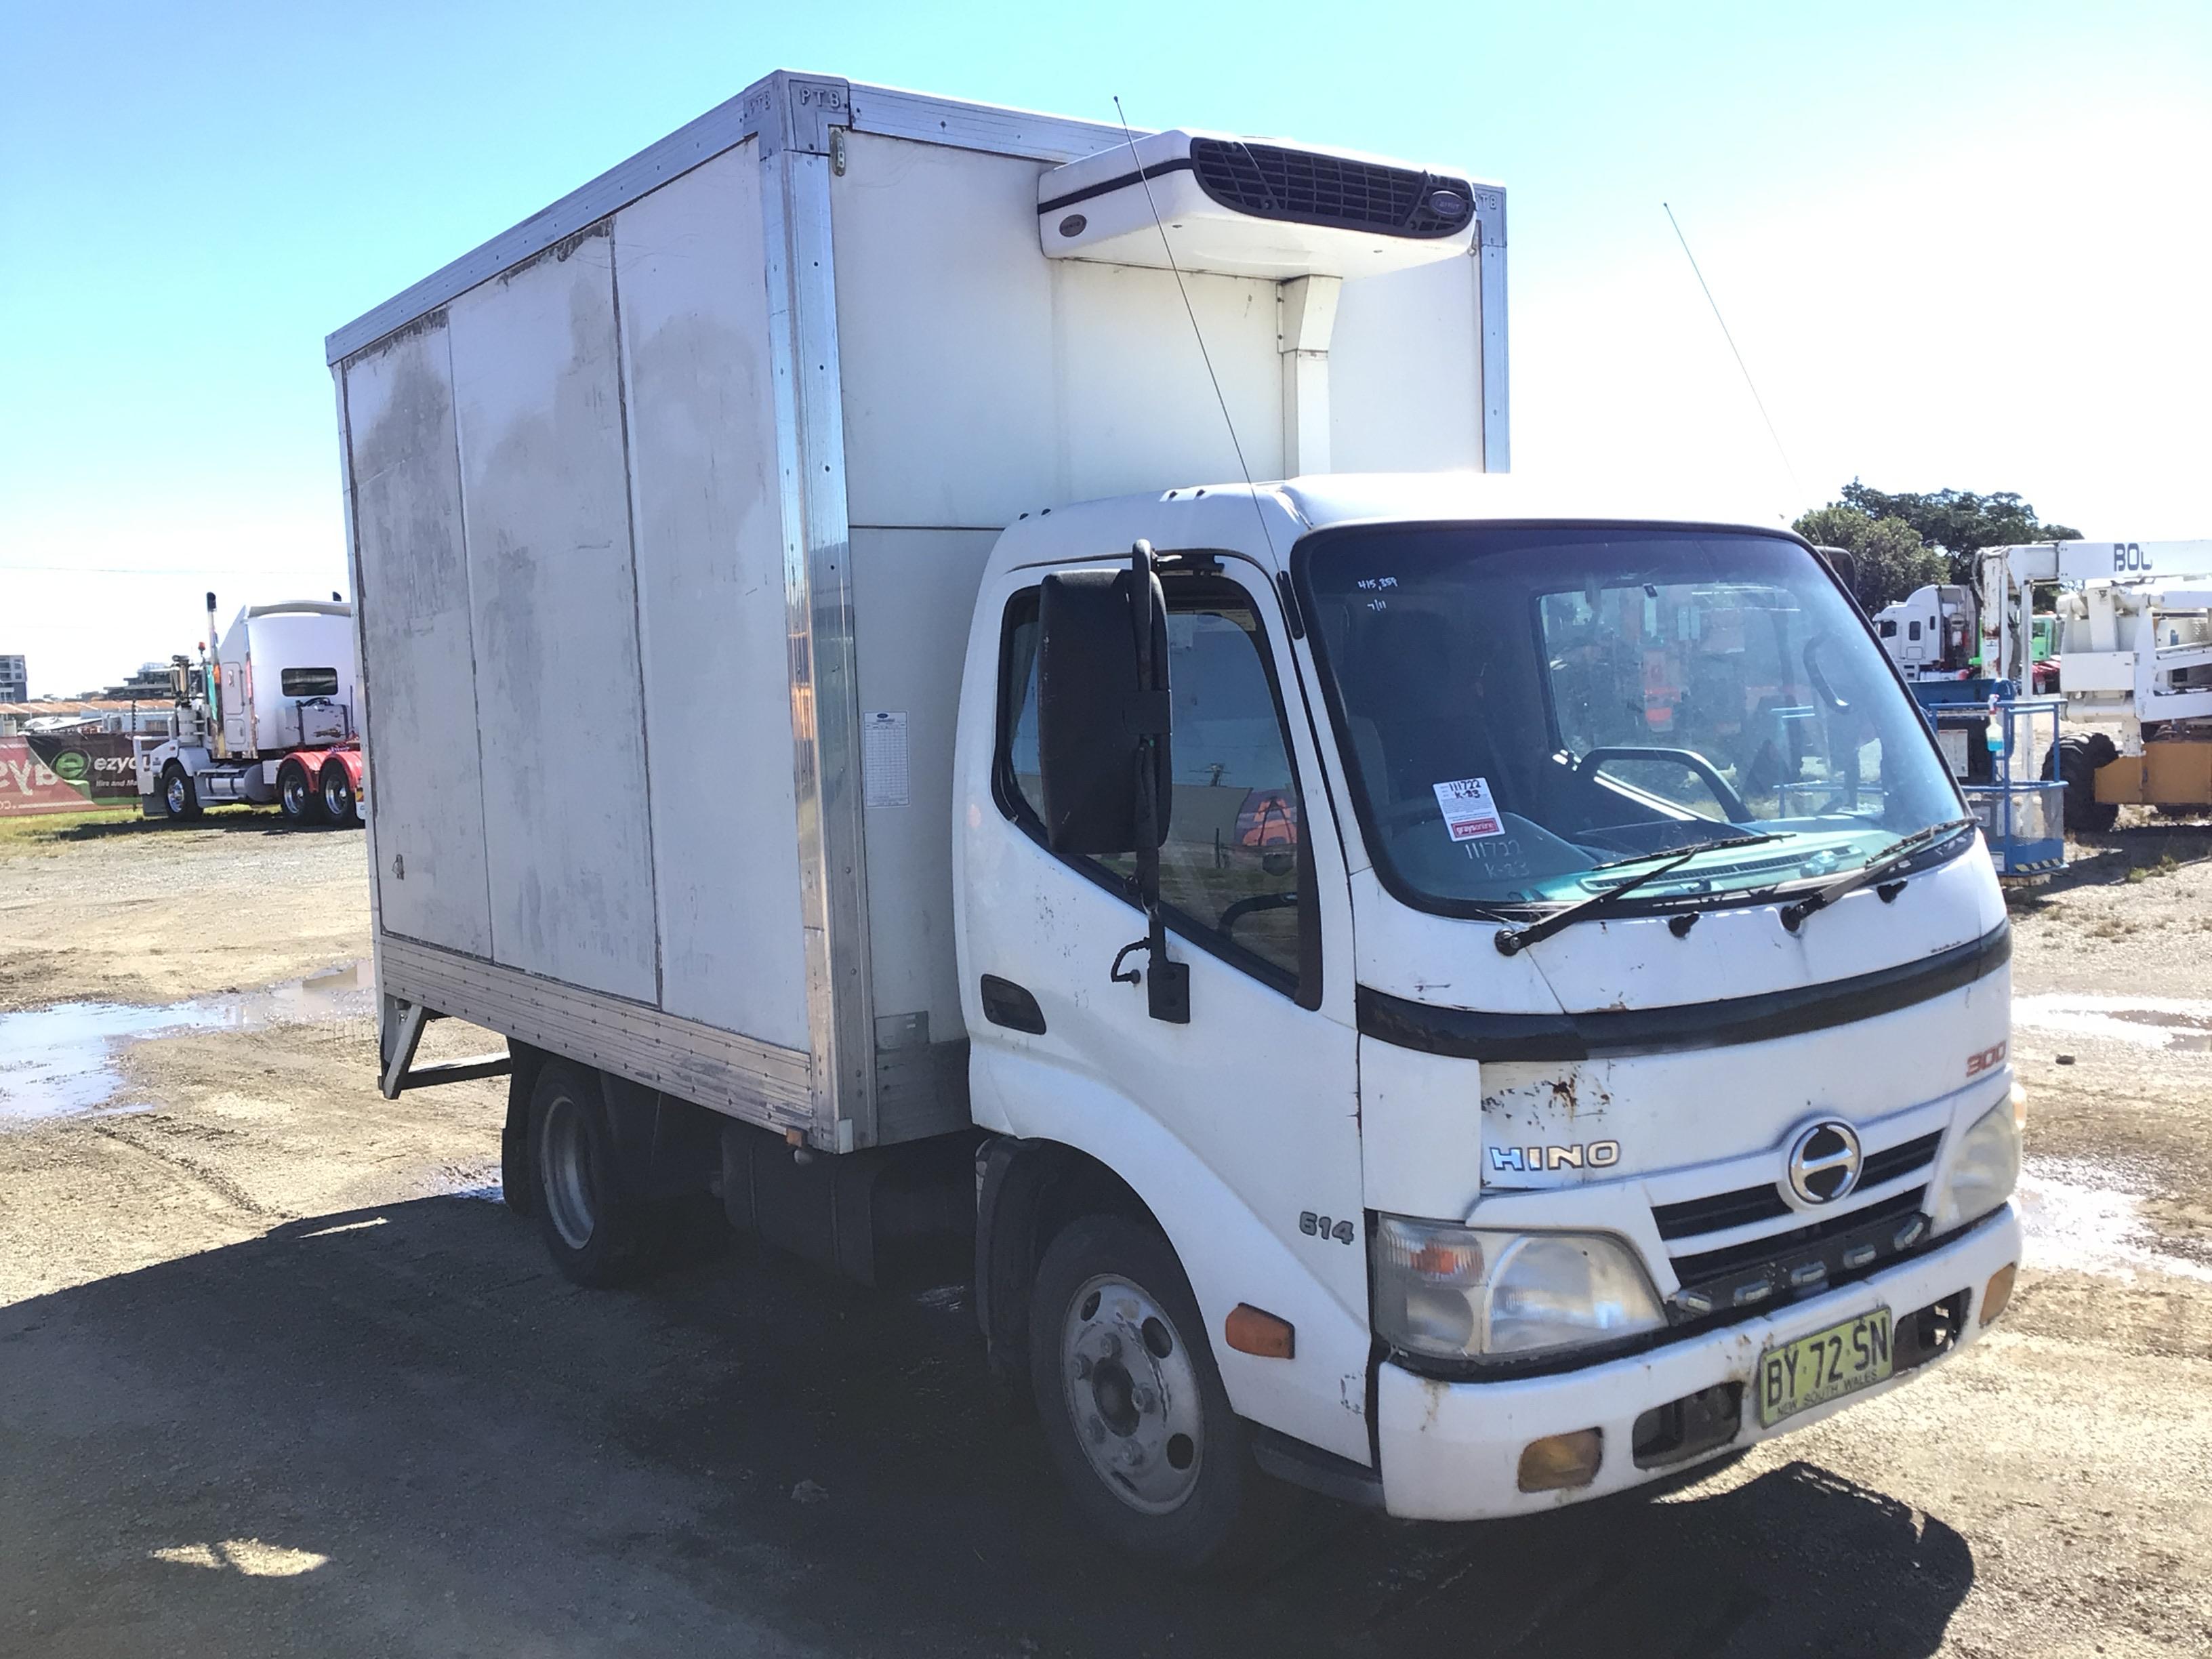 2011 Hino 300 4 x 2 Refrigerated Body Truck